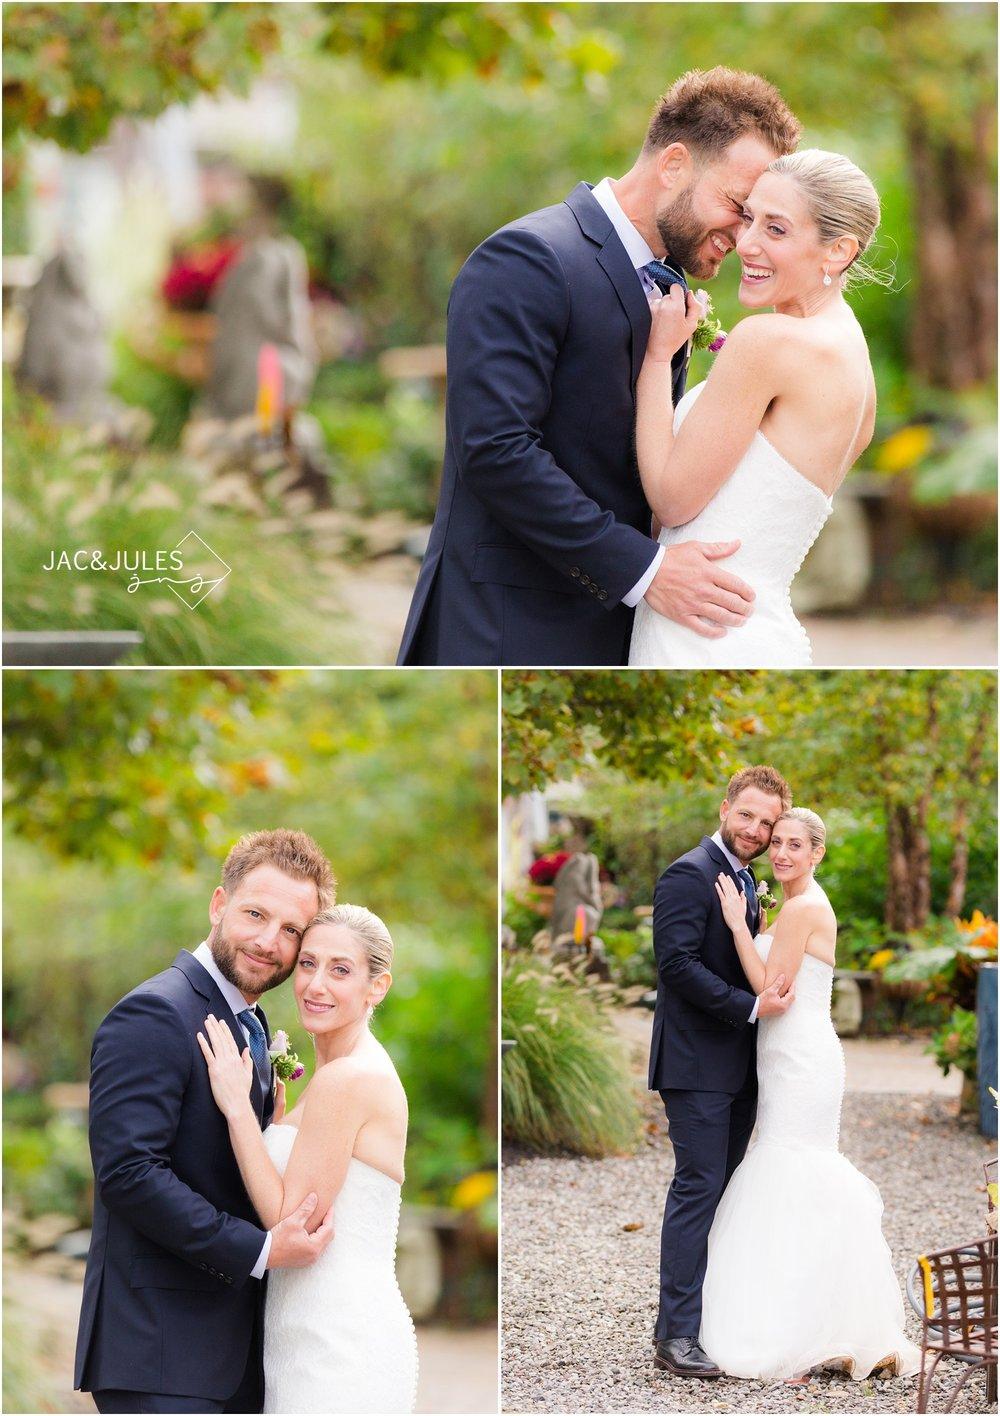 intimate garden wedding portraits of bride and groom.